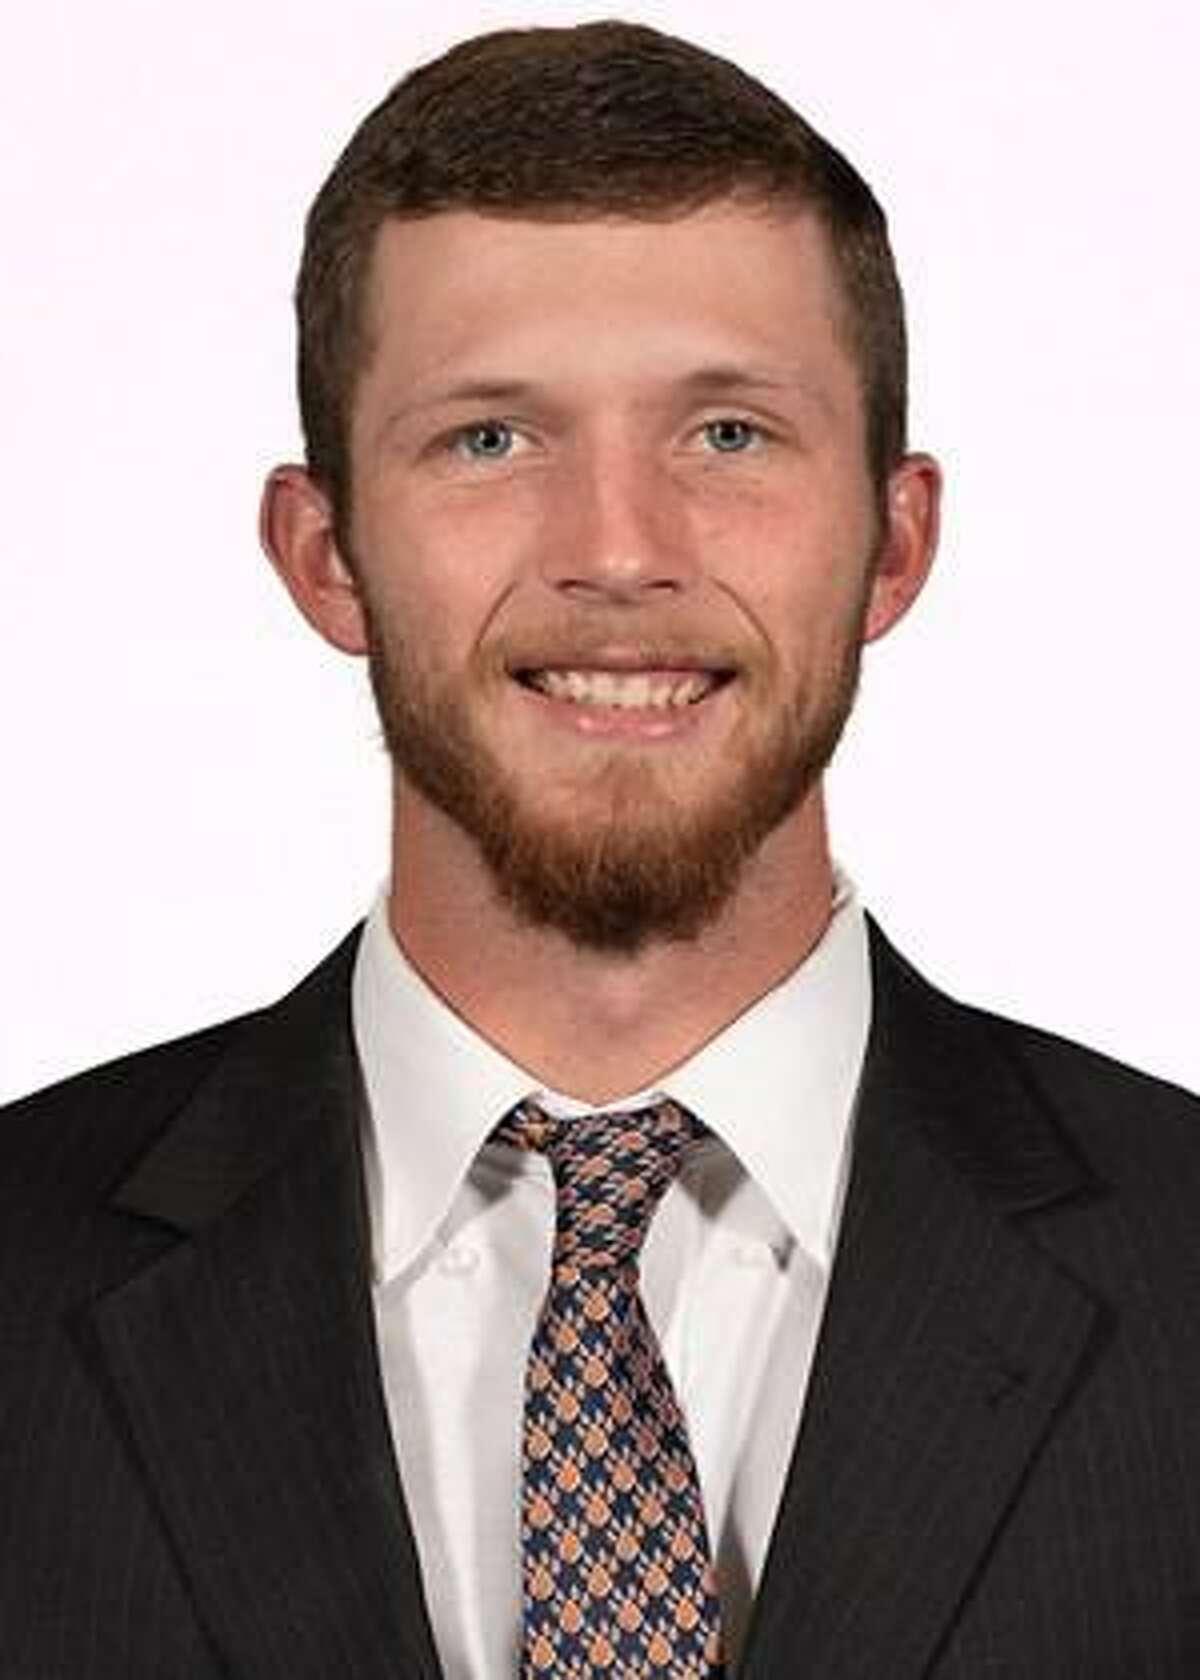 Sam Houston State pitcher Kyle Backhus, a Willis High School alum, signed with the Arizona Diamondbacks.